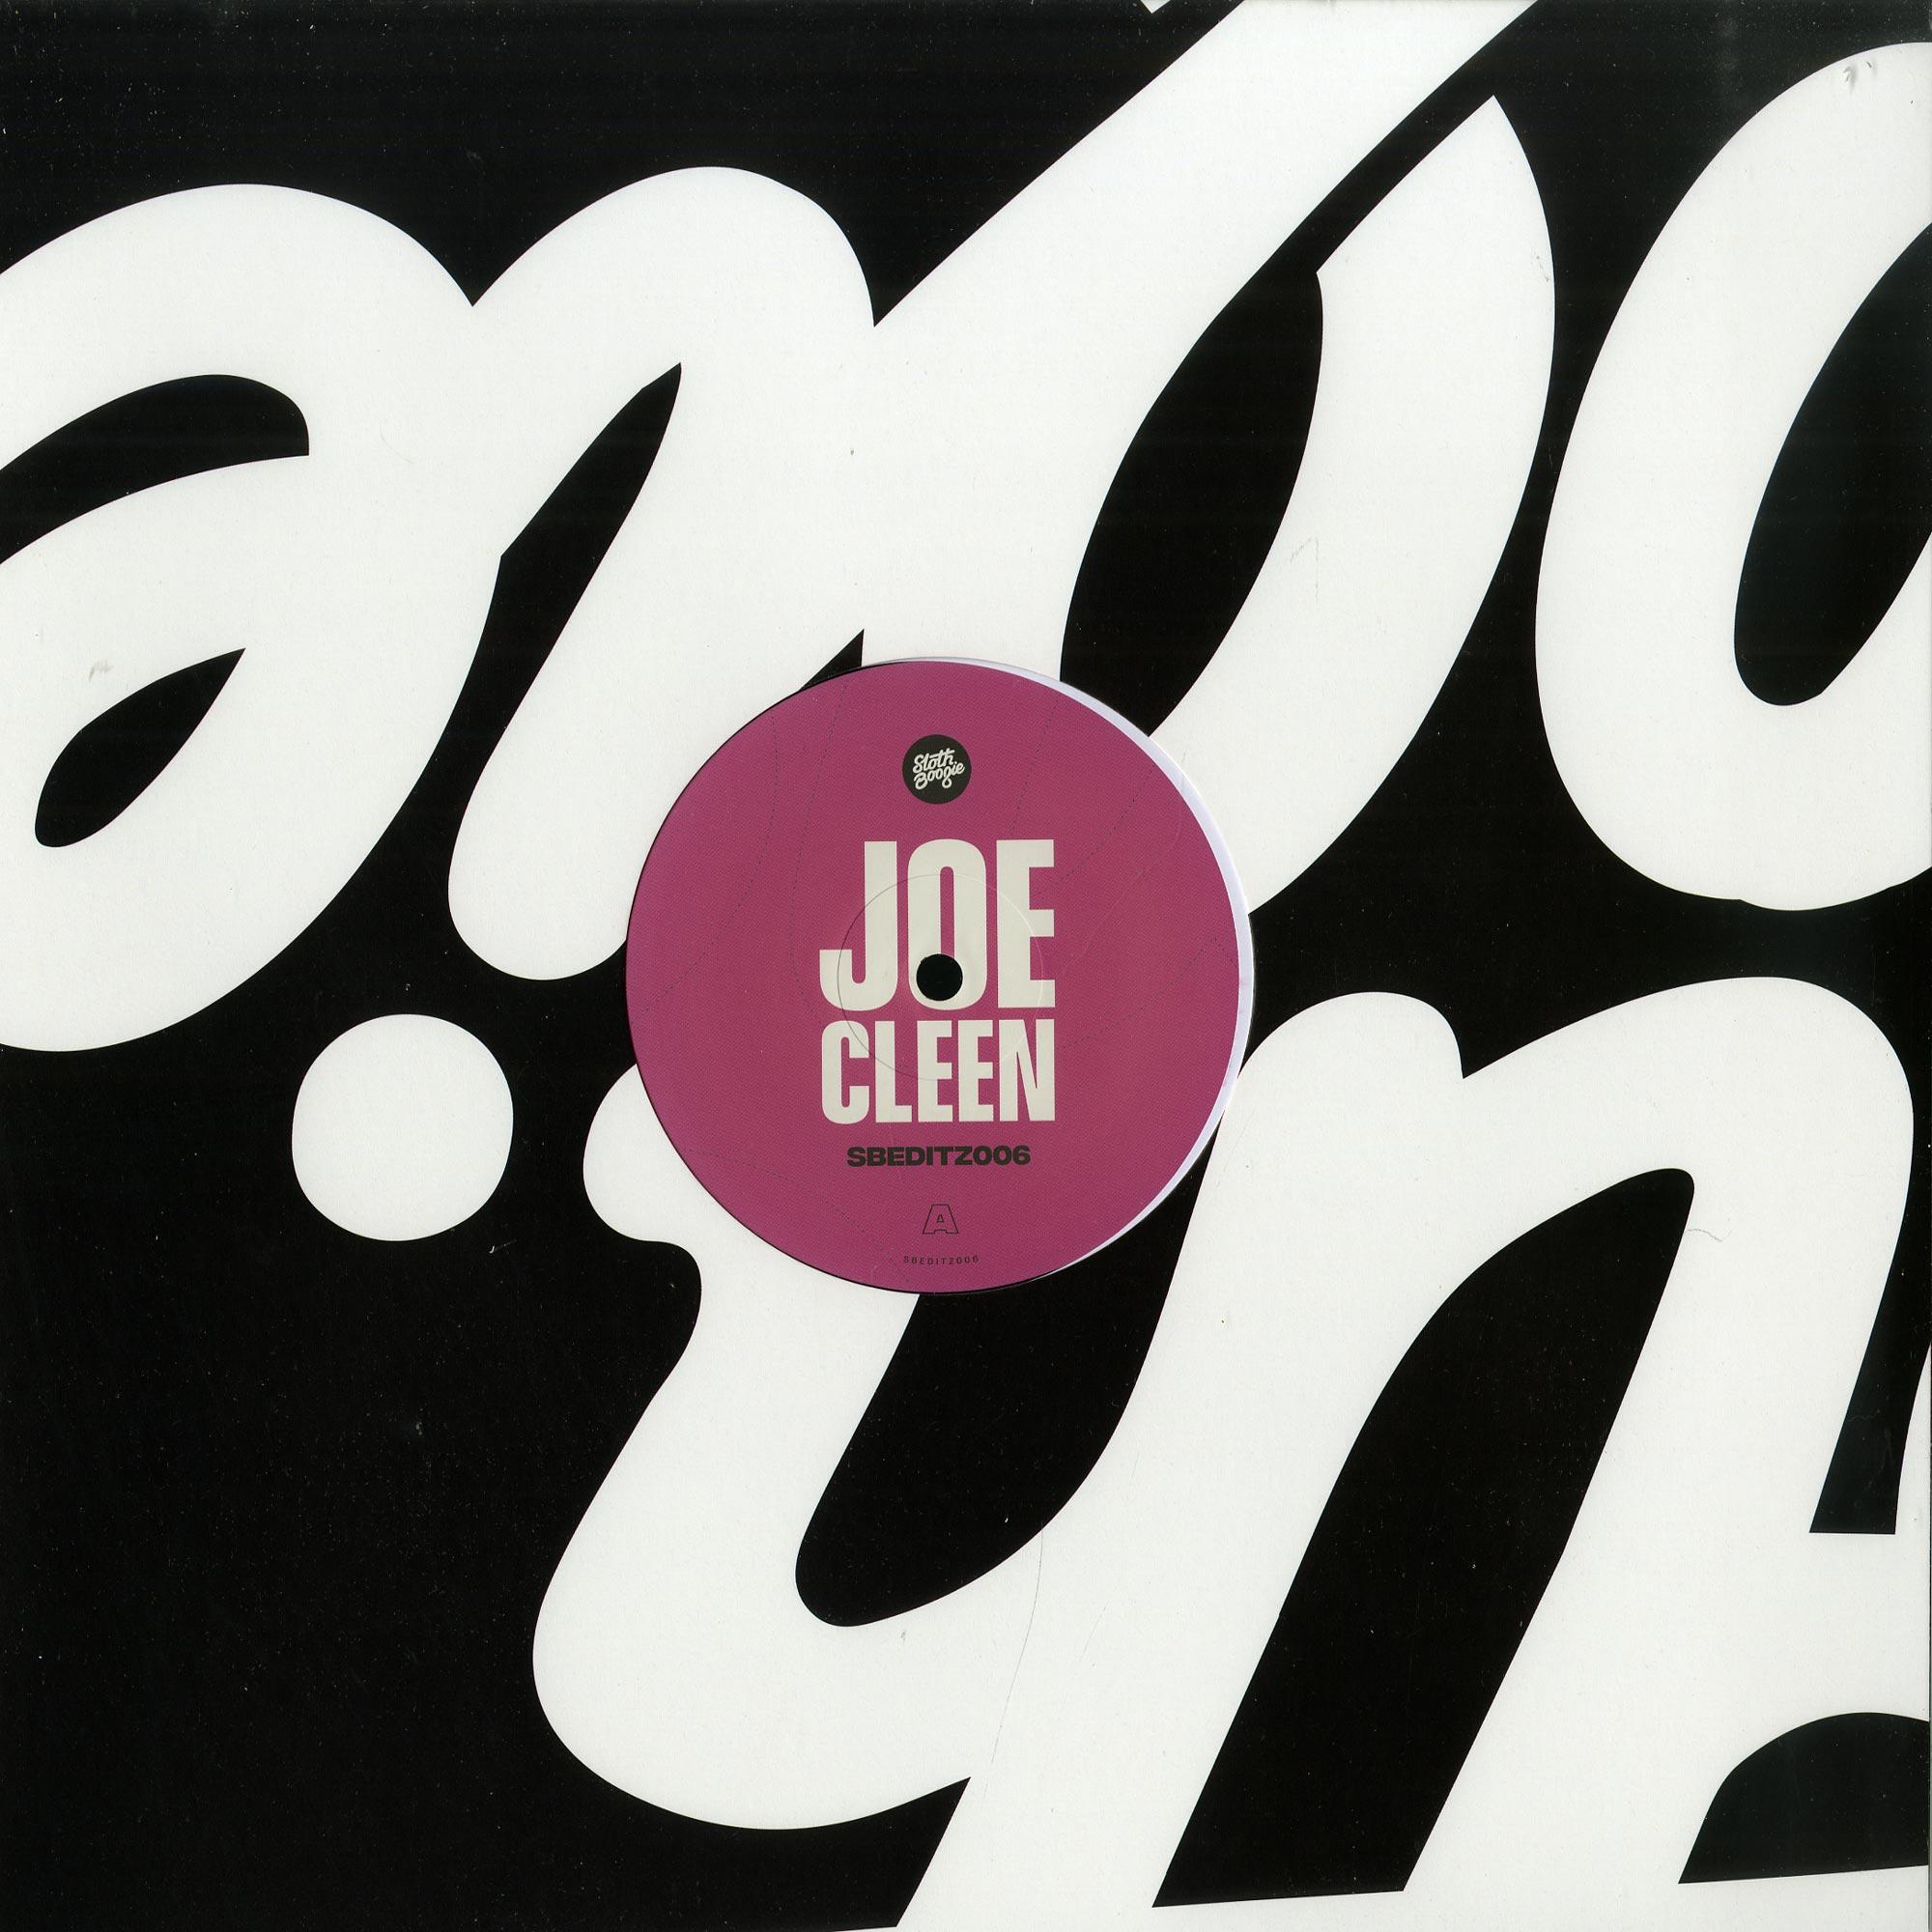 Joe Cleen - SB EDITZ006